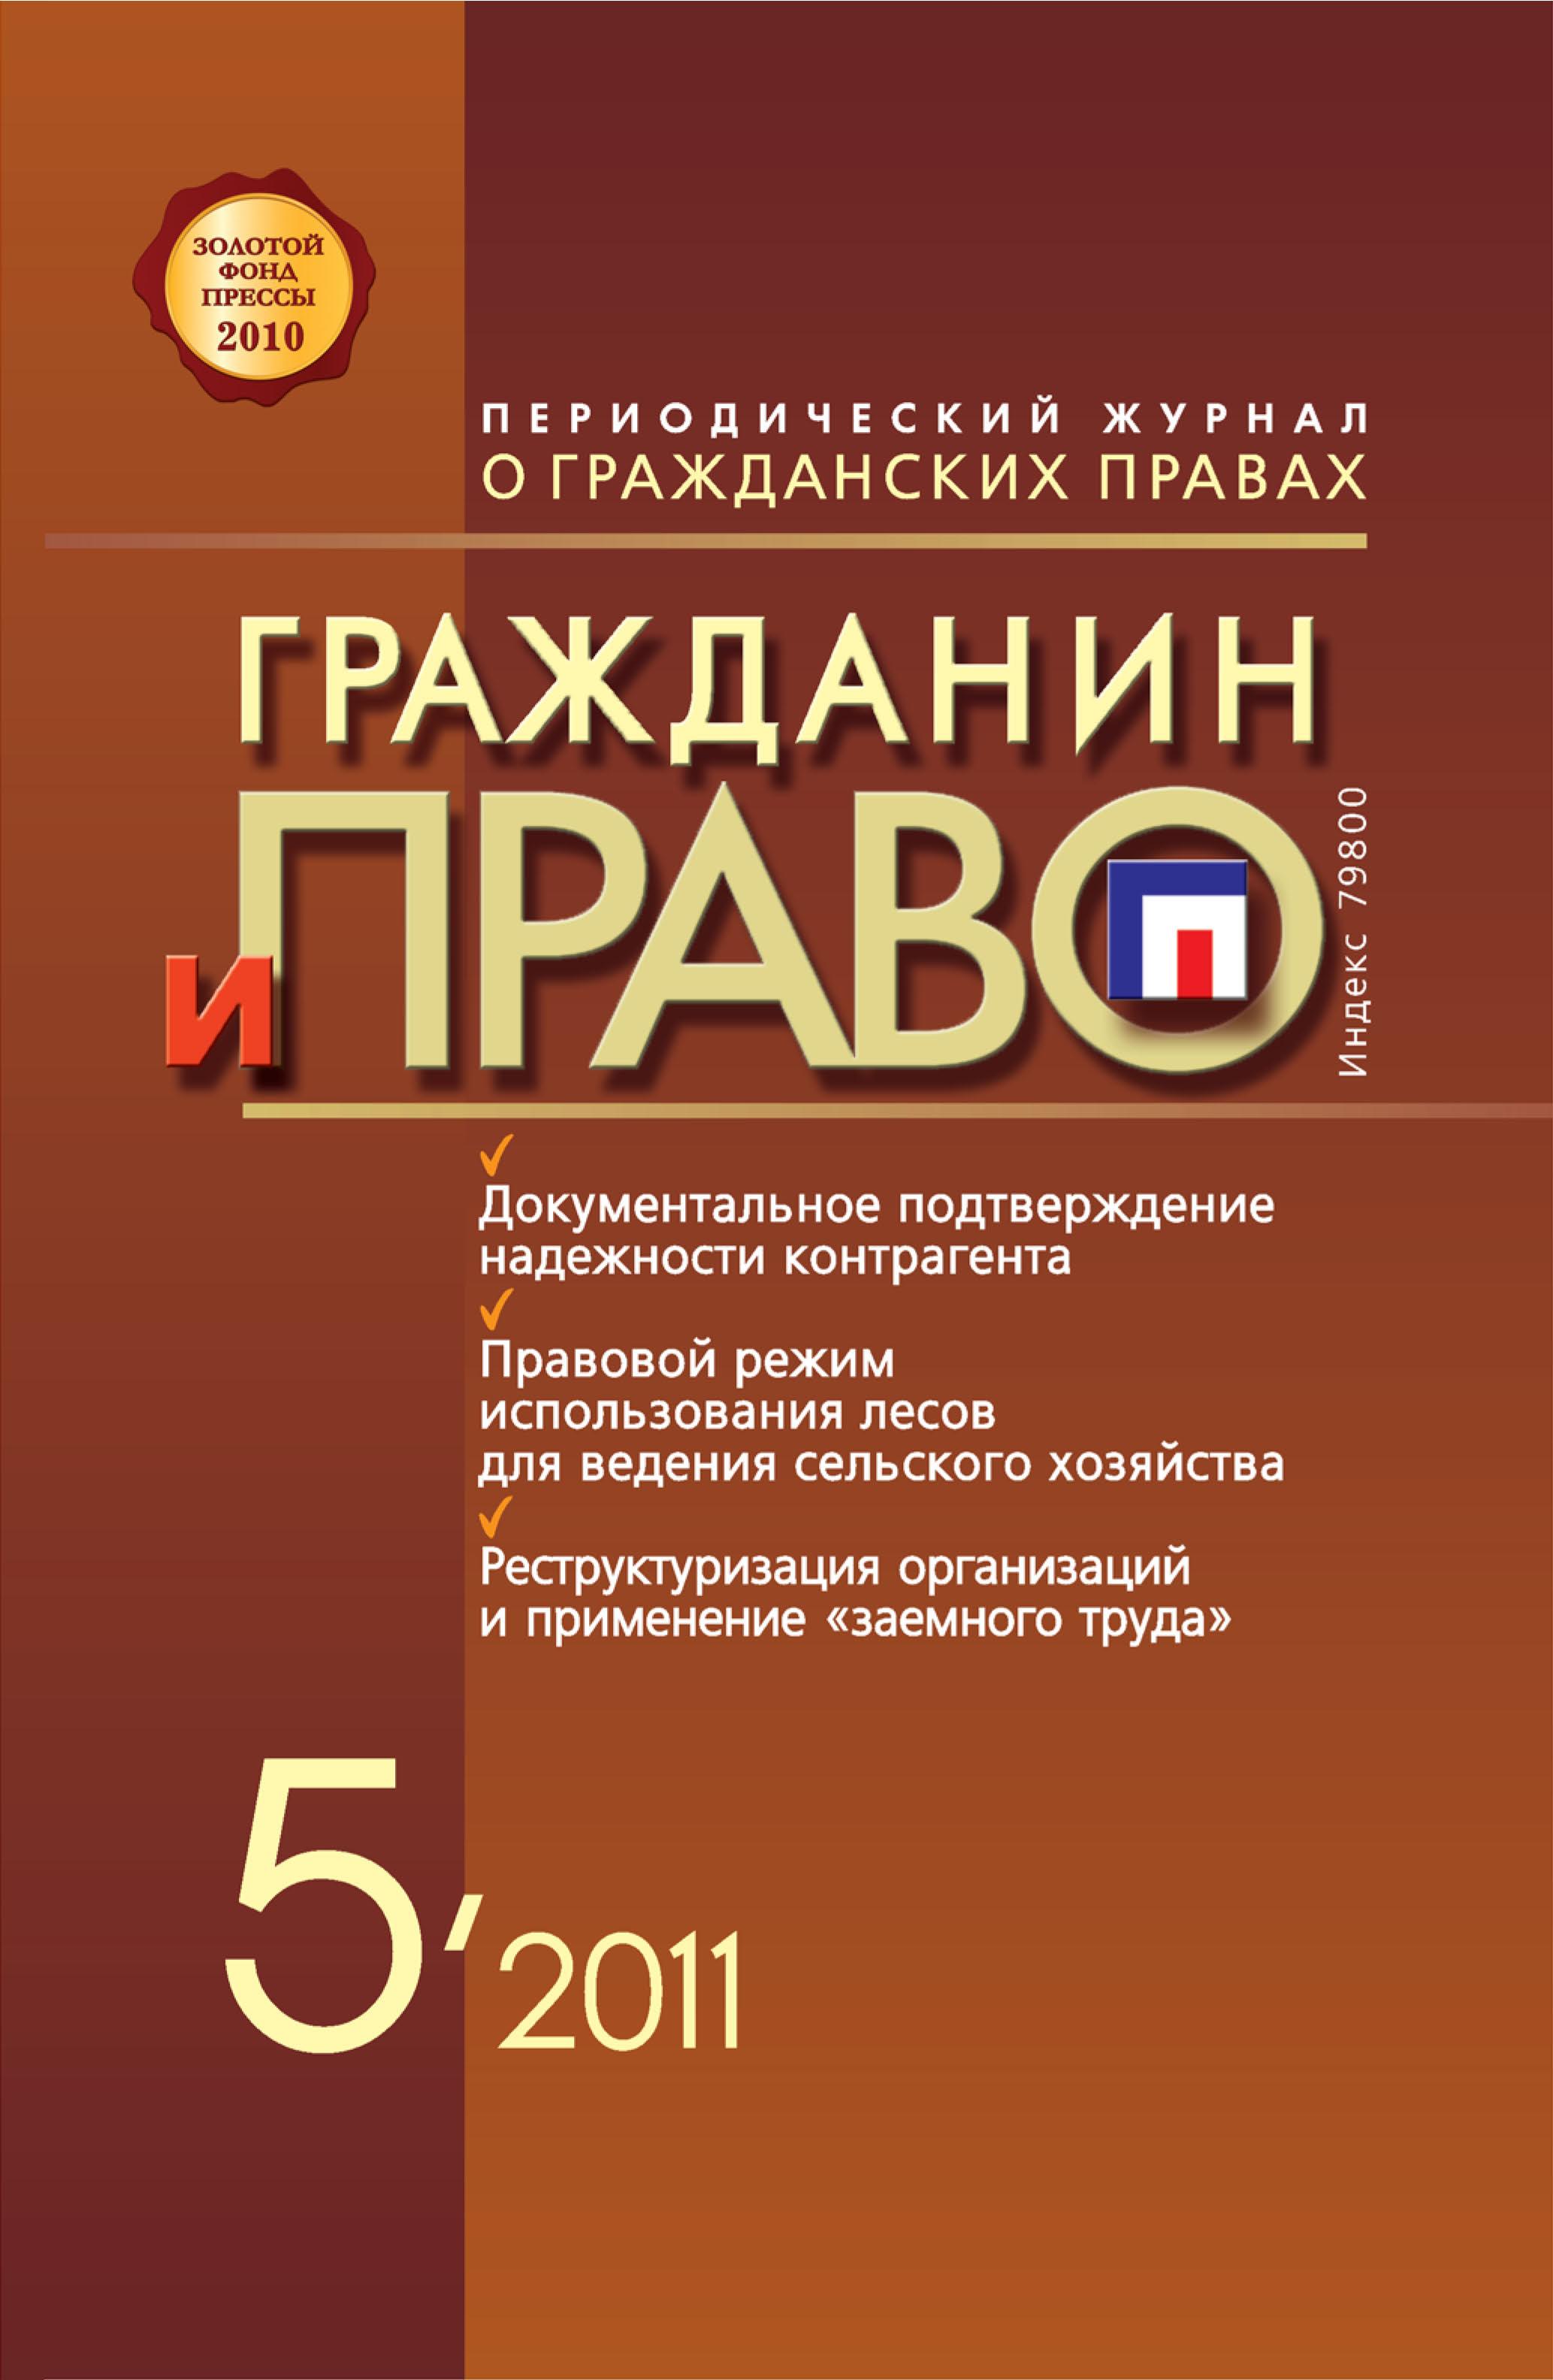 Гражданин и право №05/2011